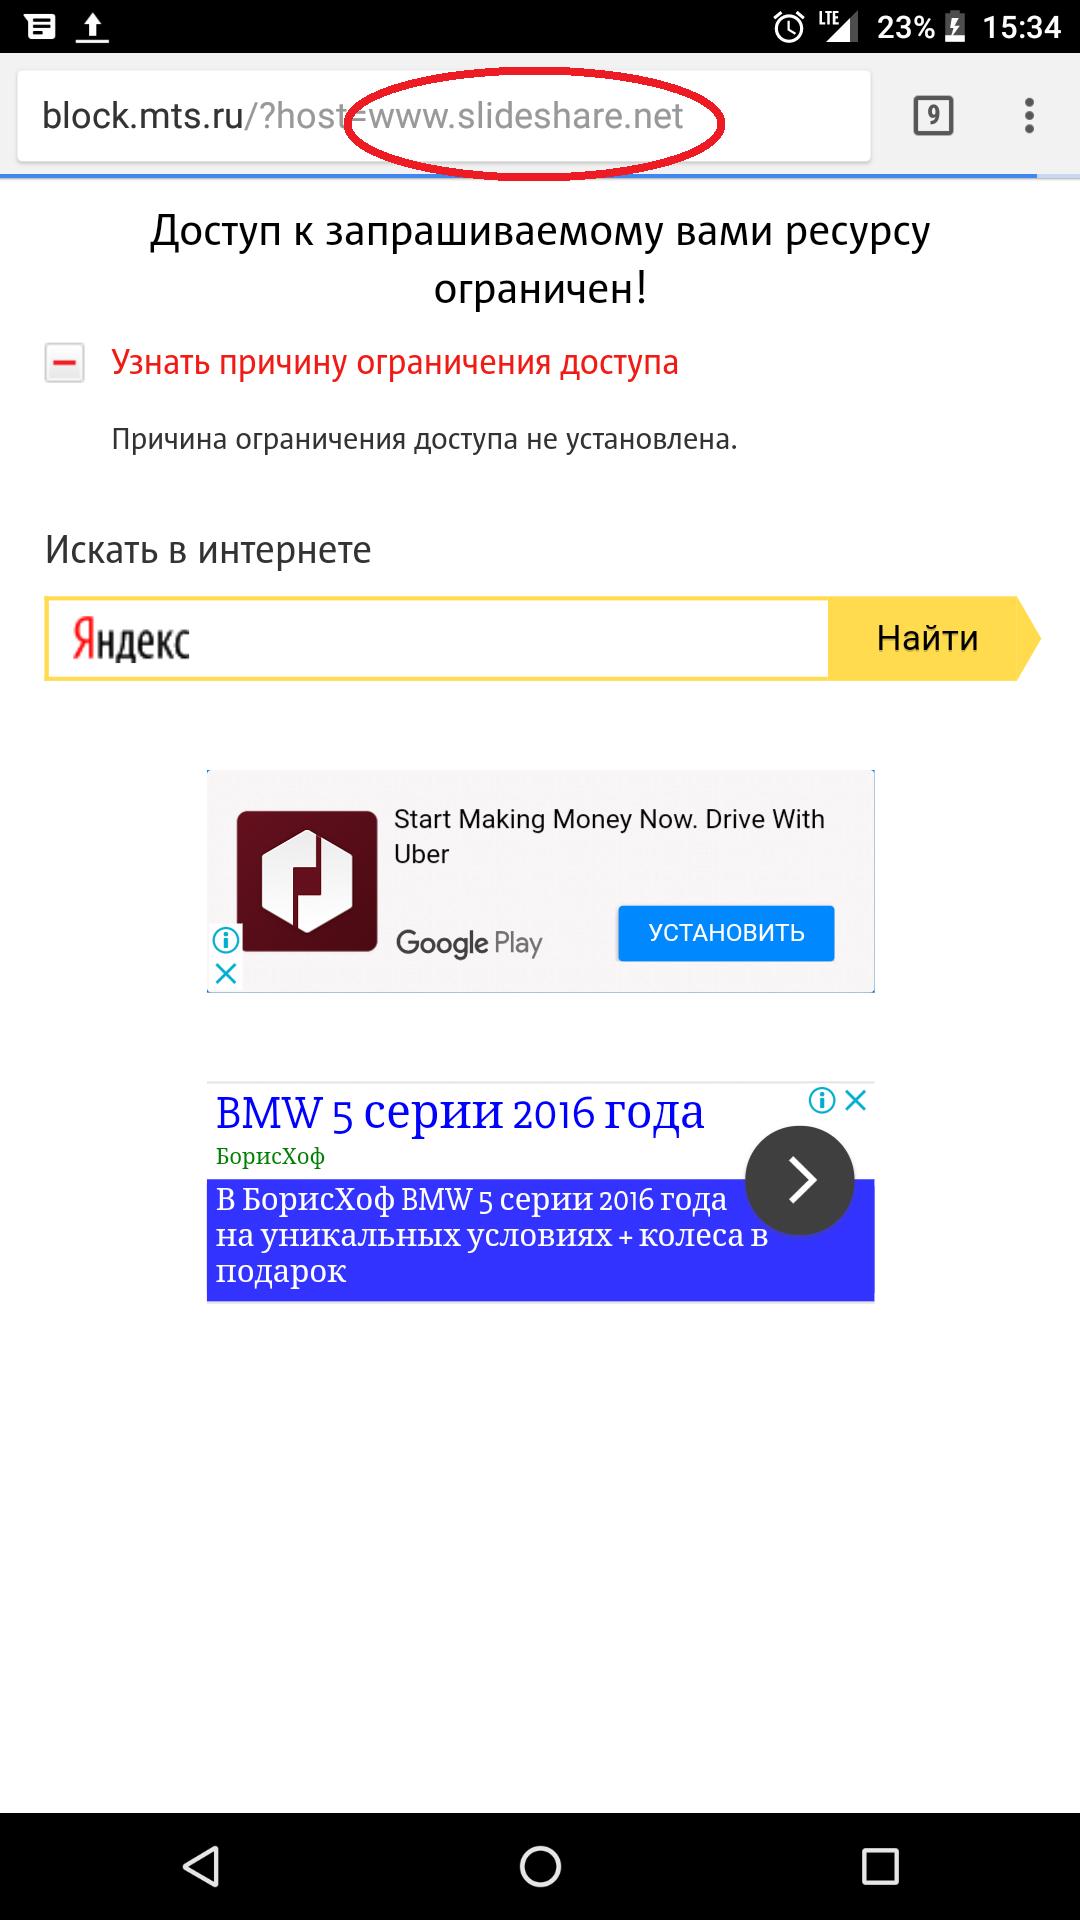 Партнеры по хостингу adsense иркутск хостинг провайдеры